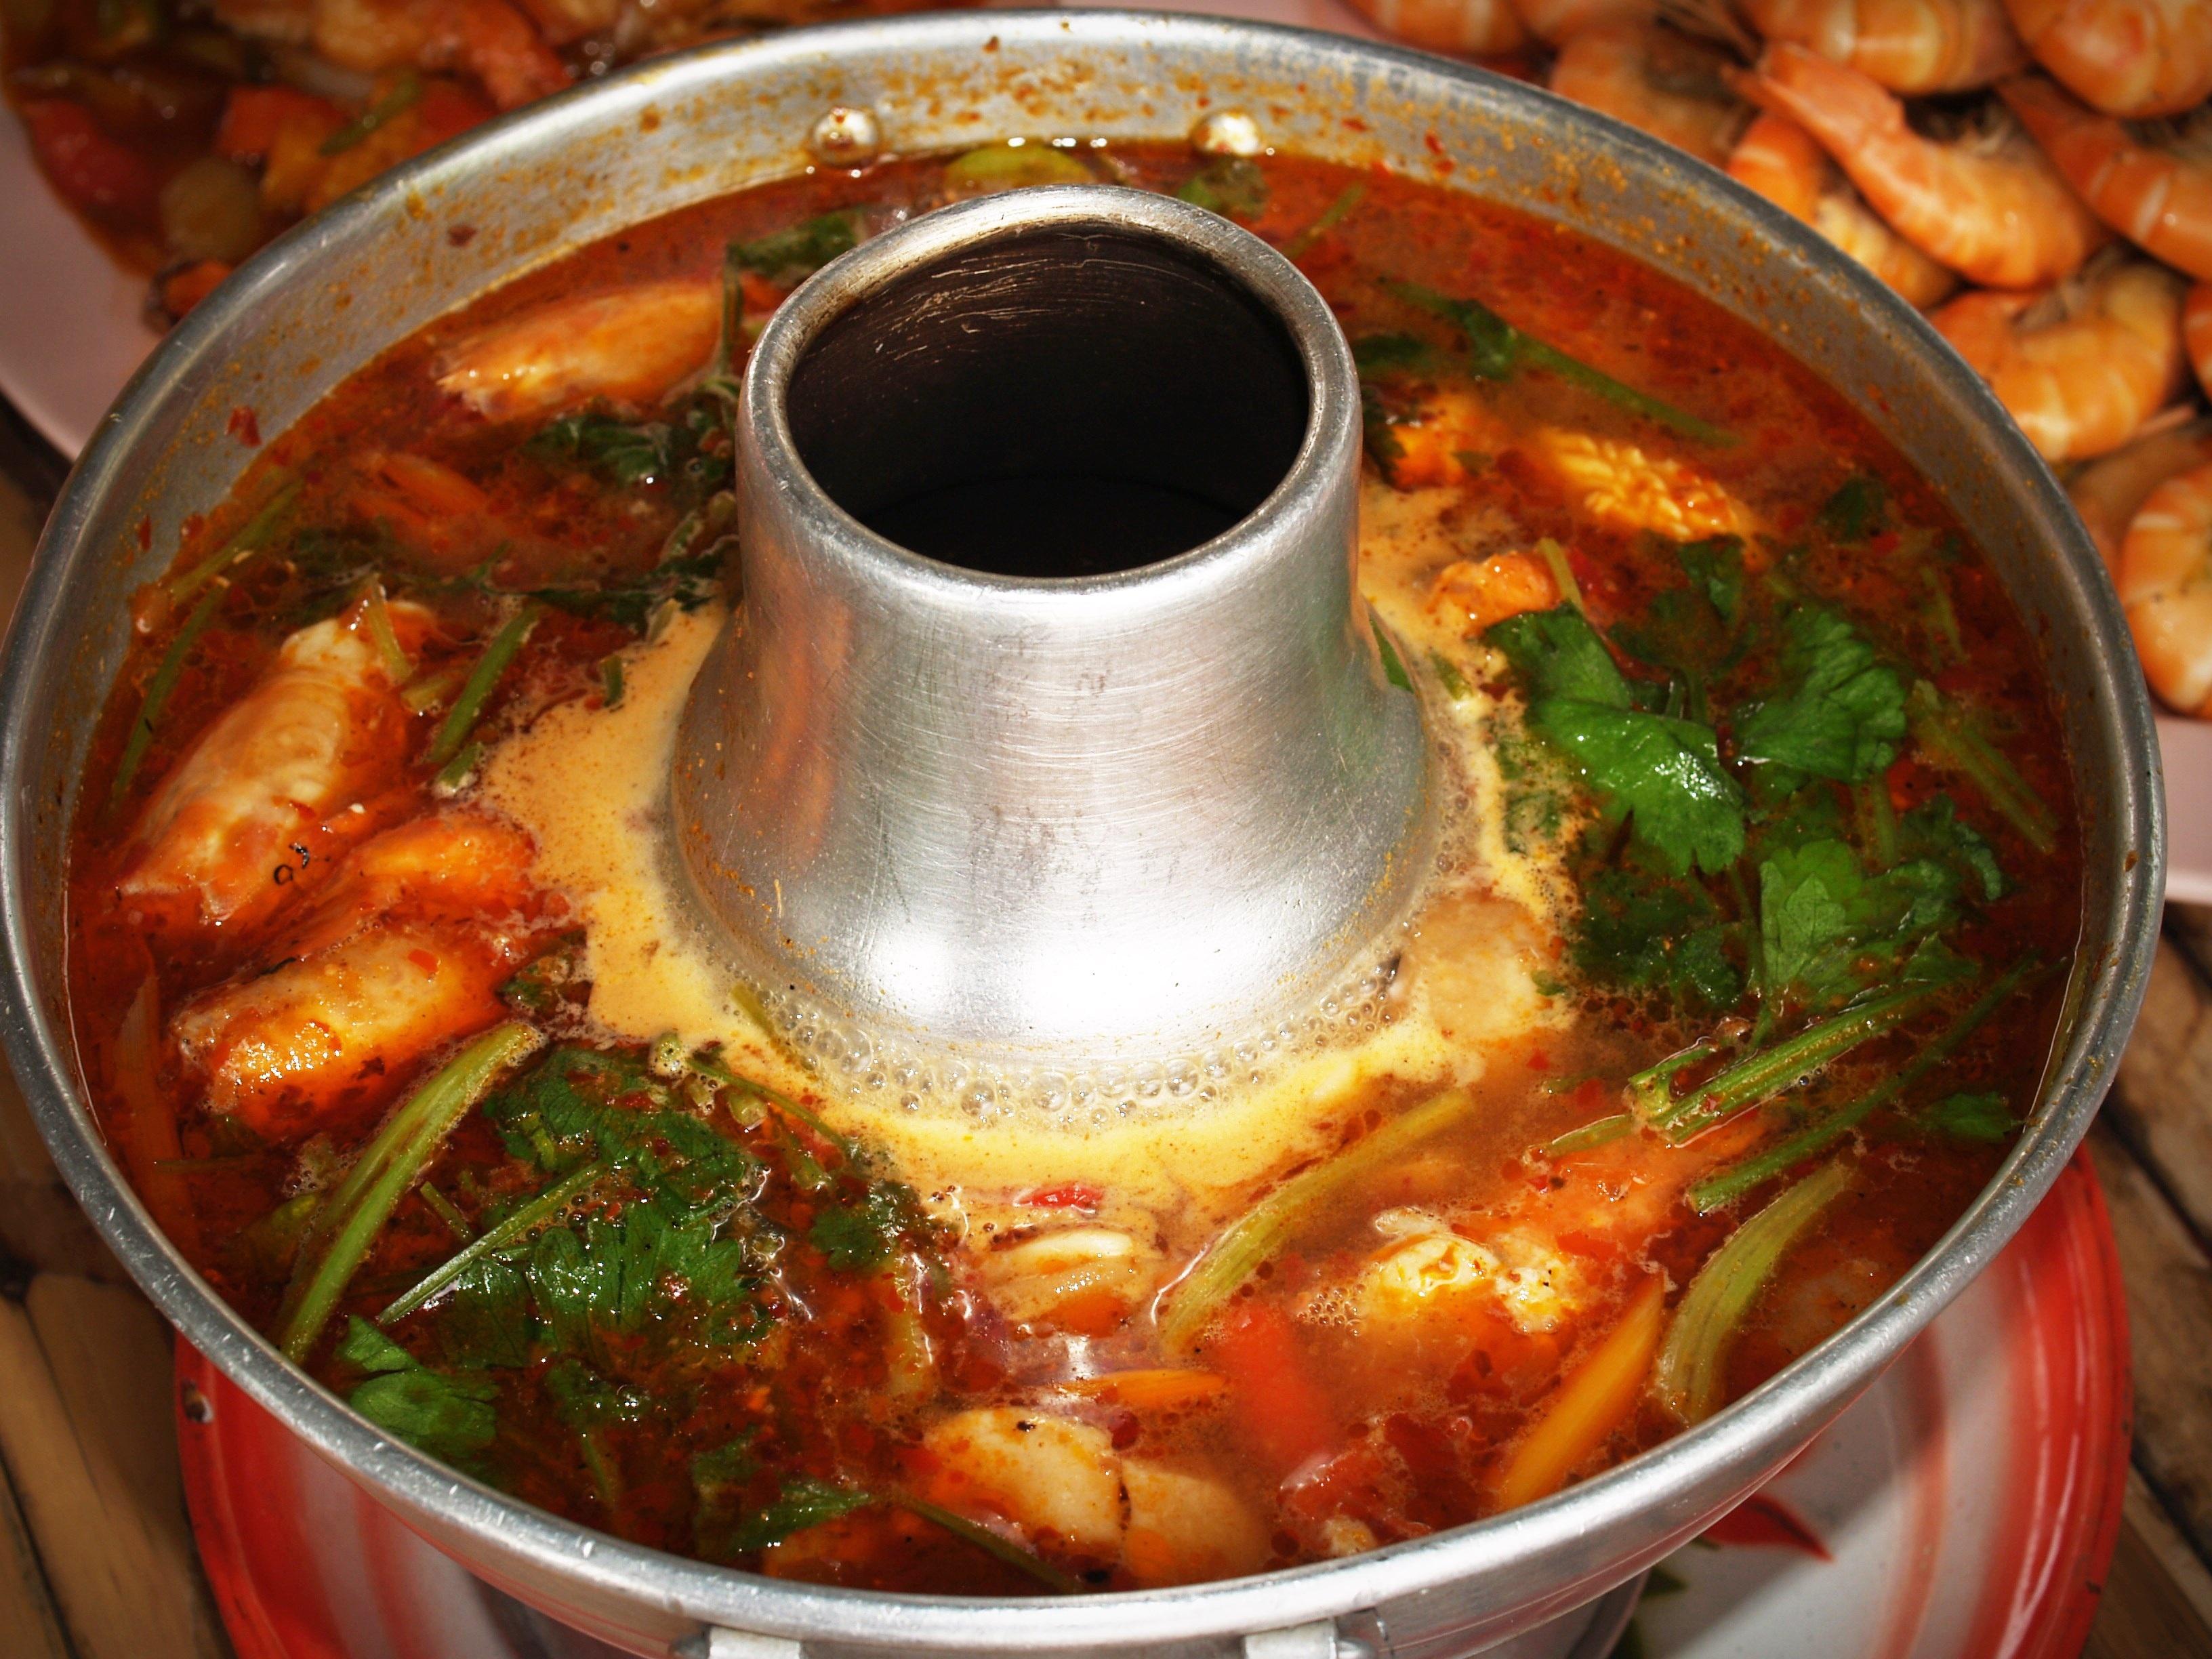 Gambar Hidangan Menghasilkan Sup Anggrek Makanan Asia